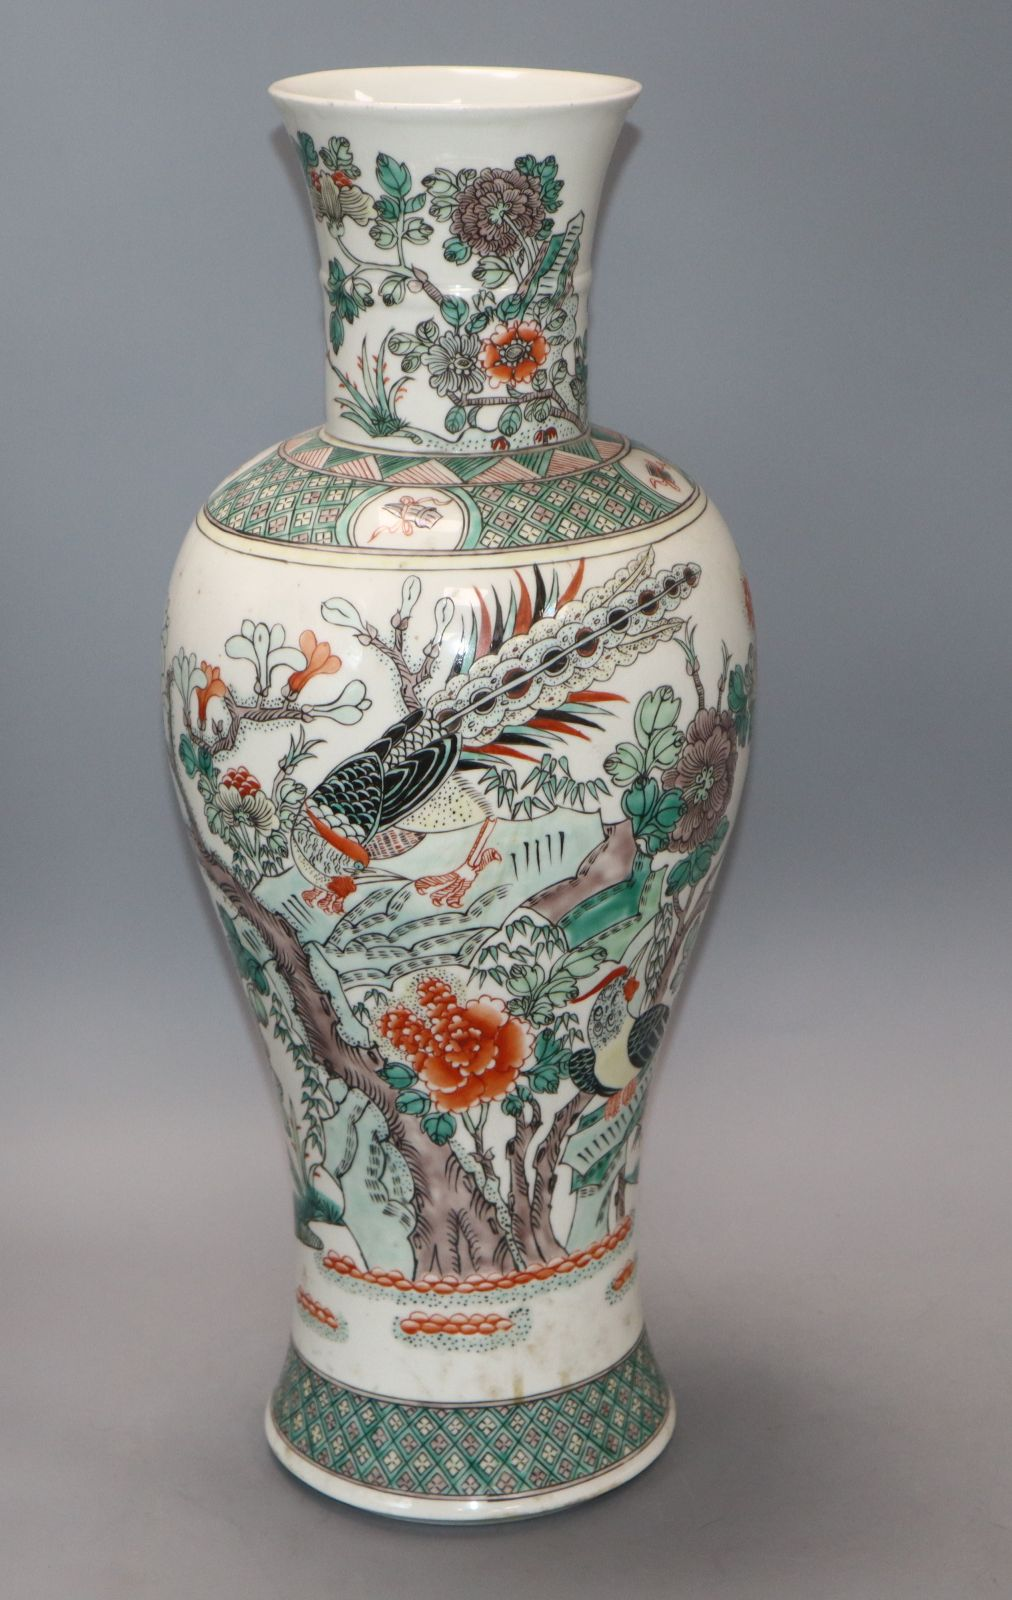 Lot 26 - A Samson of Paris famille verte vase c.1900 height 46cm